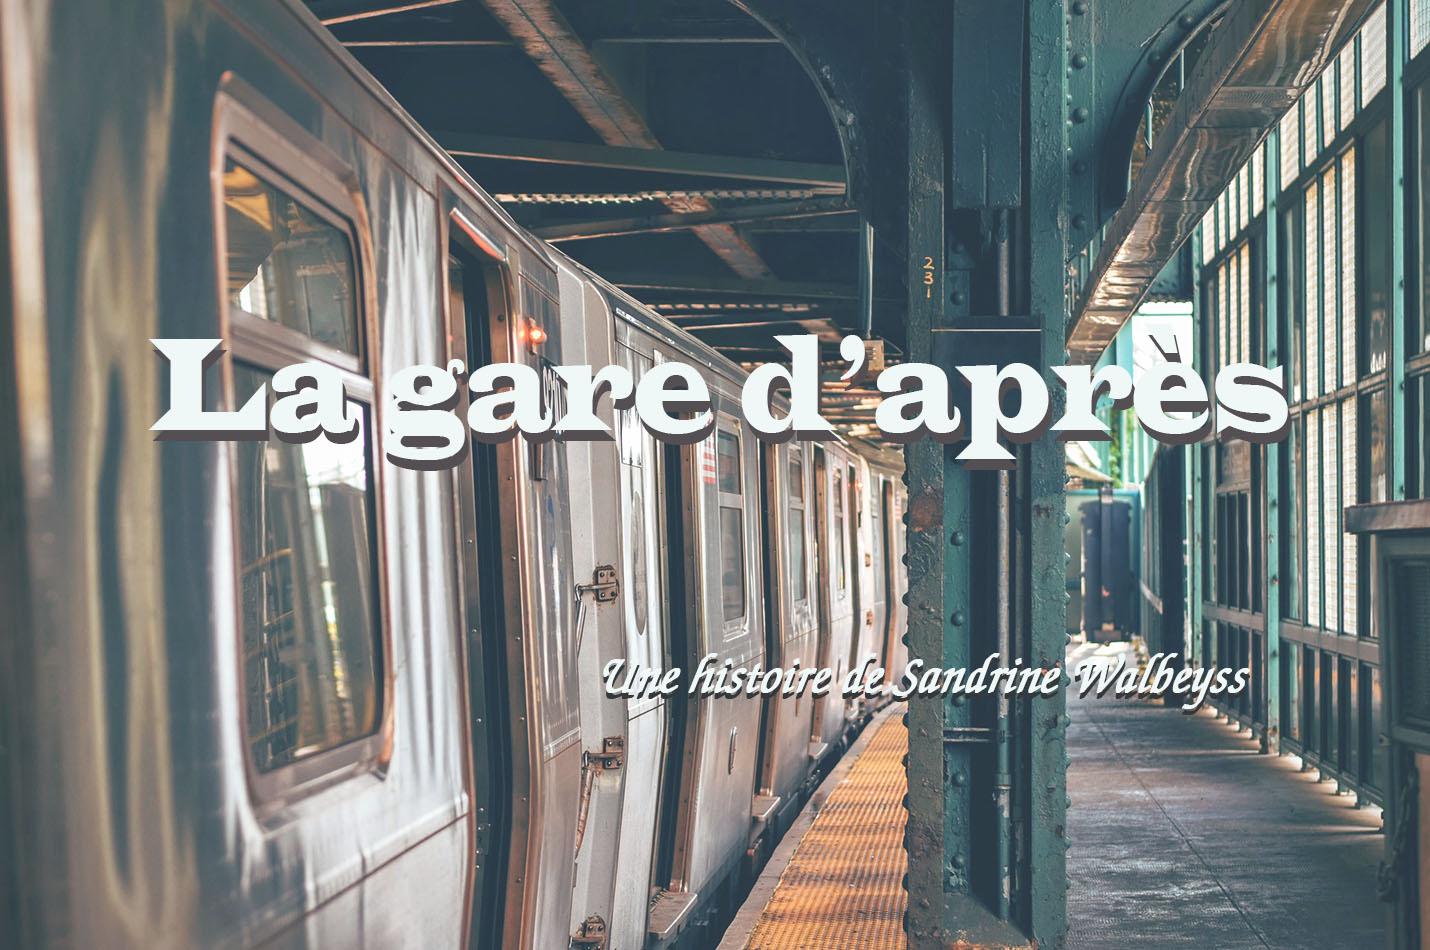 La gare d'après - Une histoire de Sandrine WALBEYSS